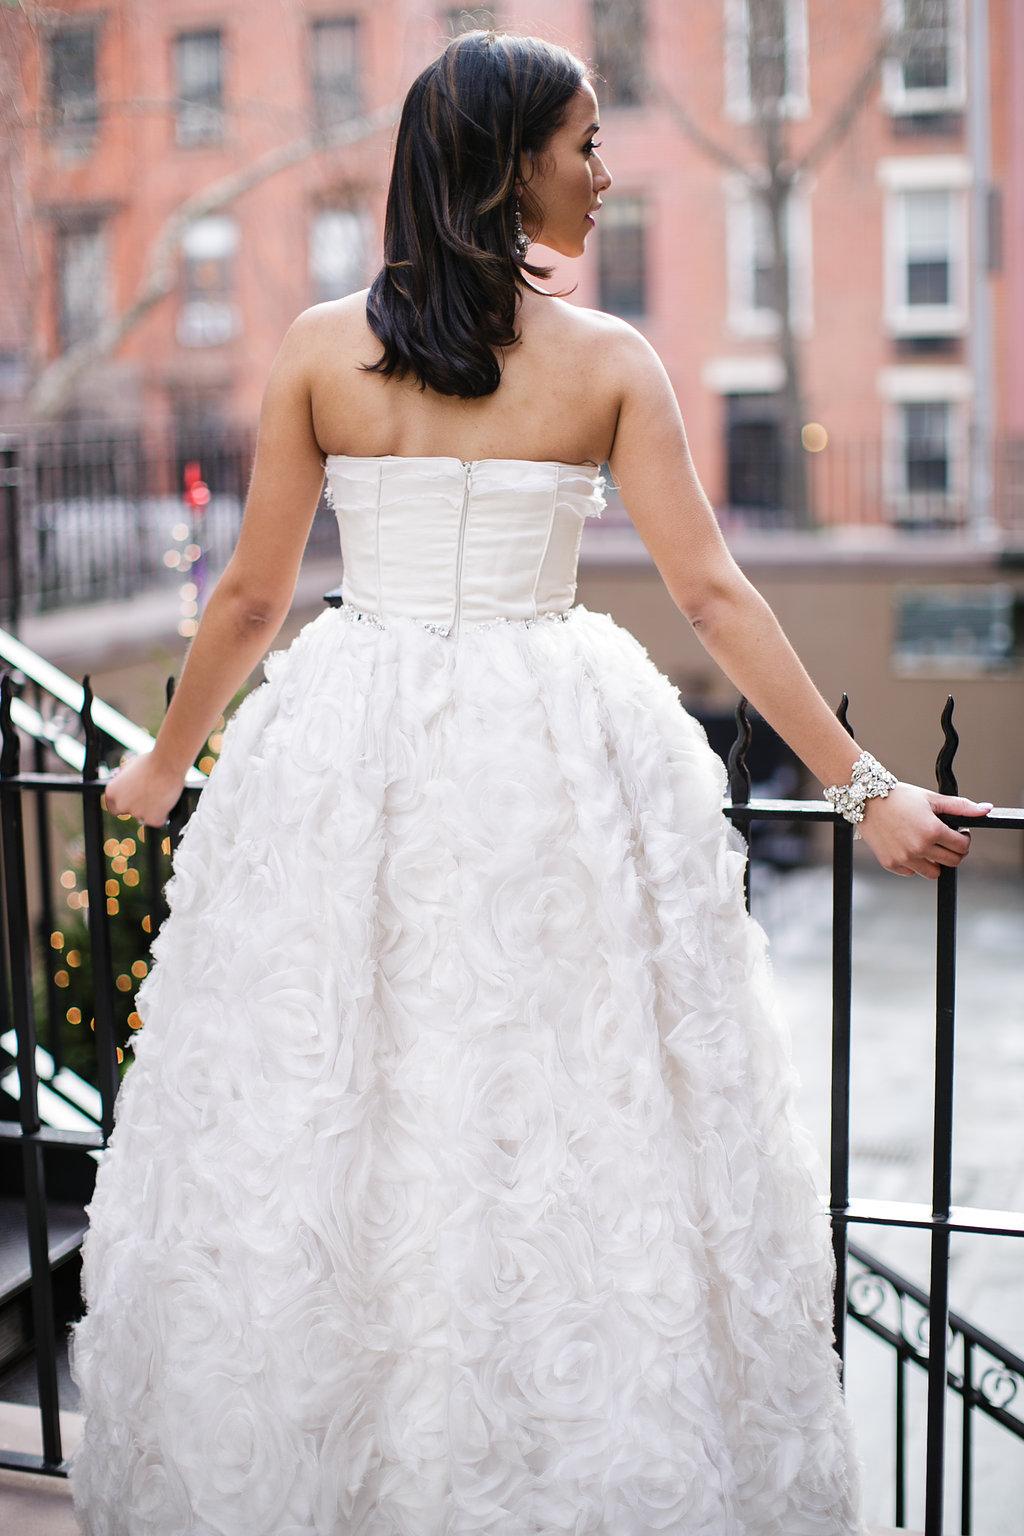 NYC_Highline_Hotel_Bridal_Shoot_PetronellaPhotography-65.jpg